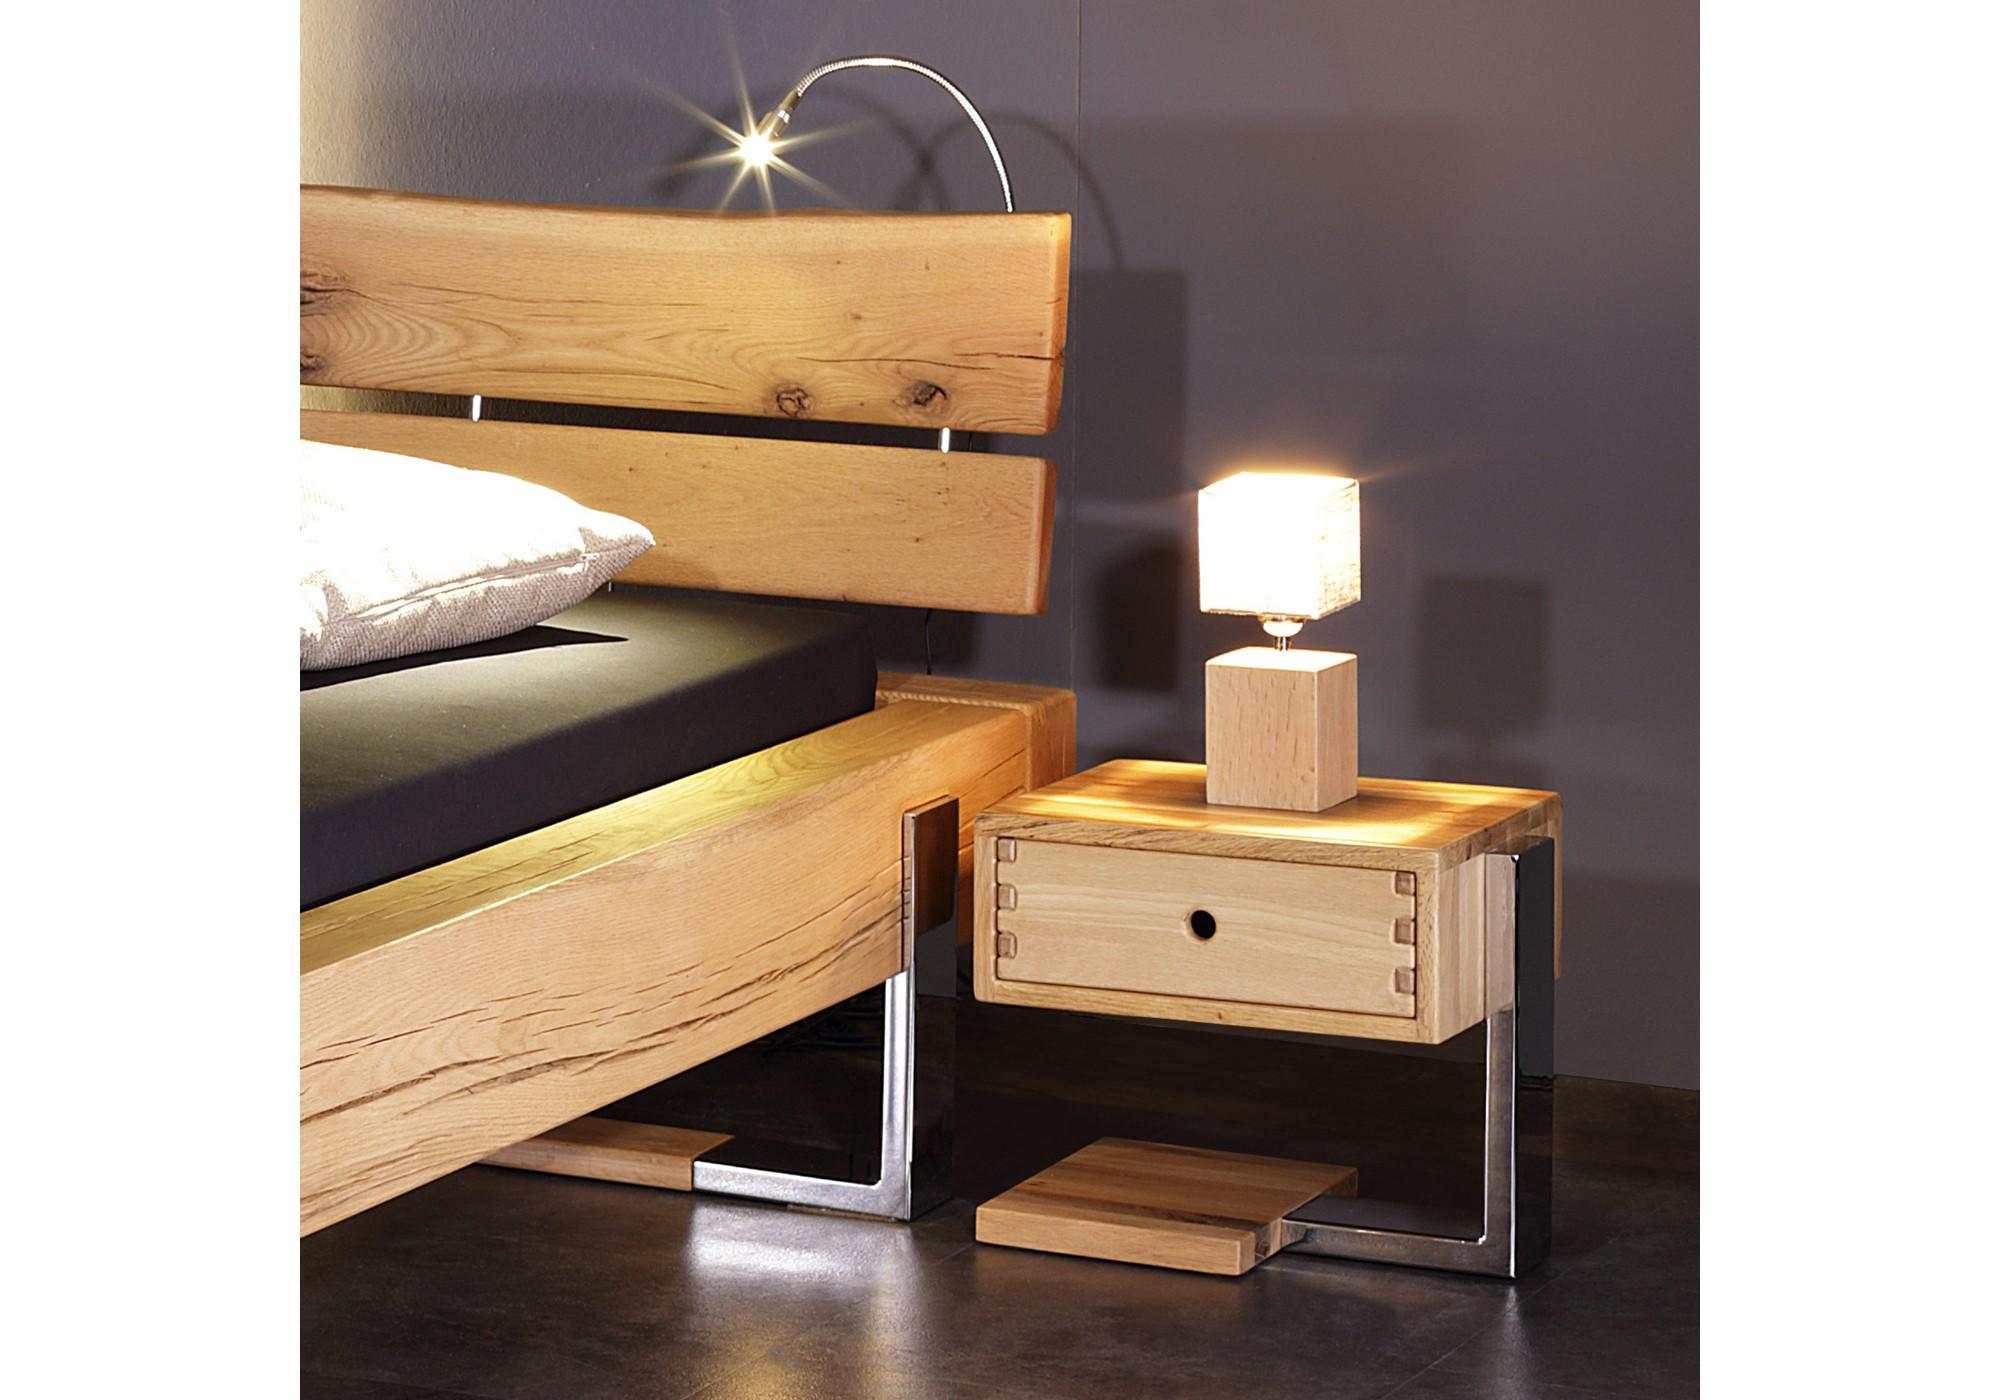 sprenger m bel massivholz kufen balken bett betten kraft. Black Bedroom Furniture Sets. Home Design Ideas